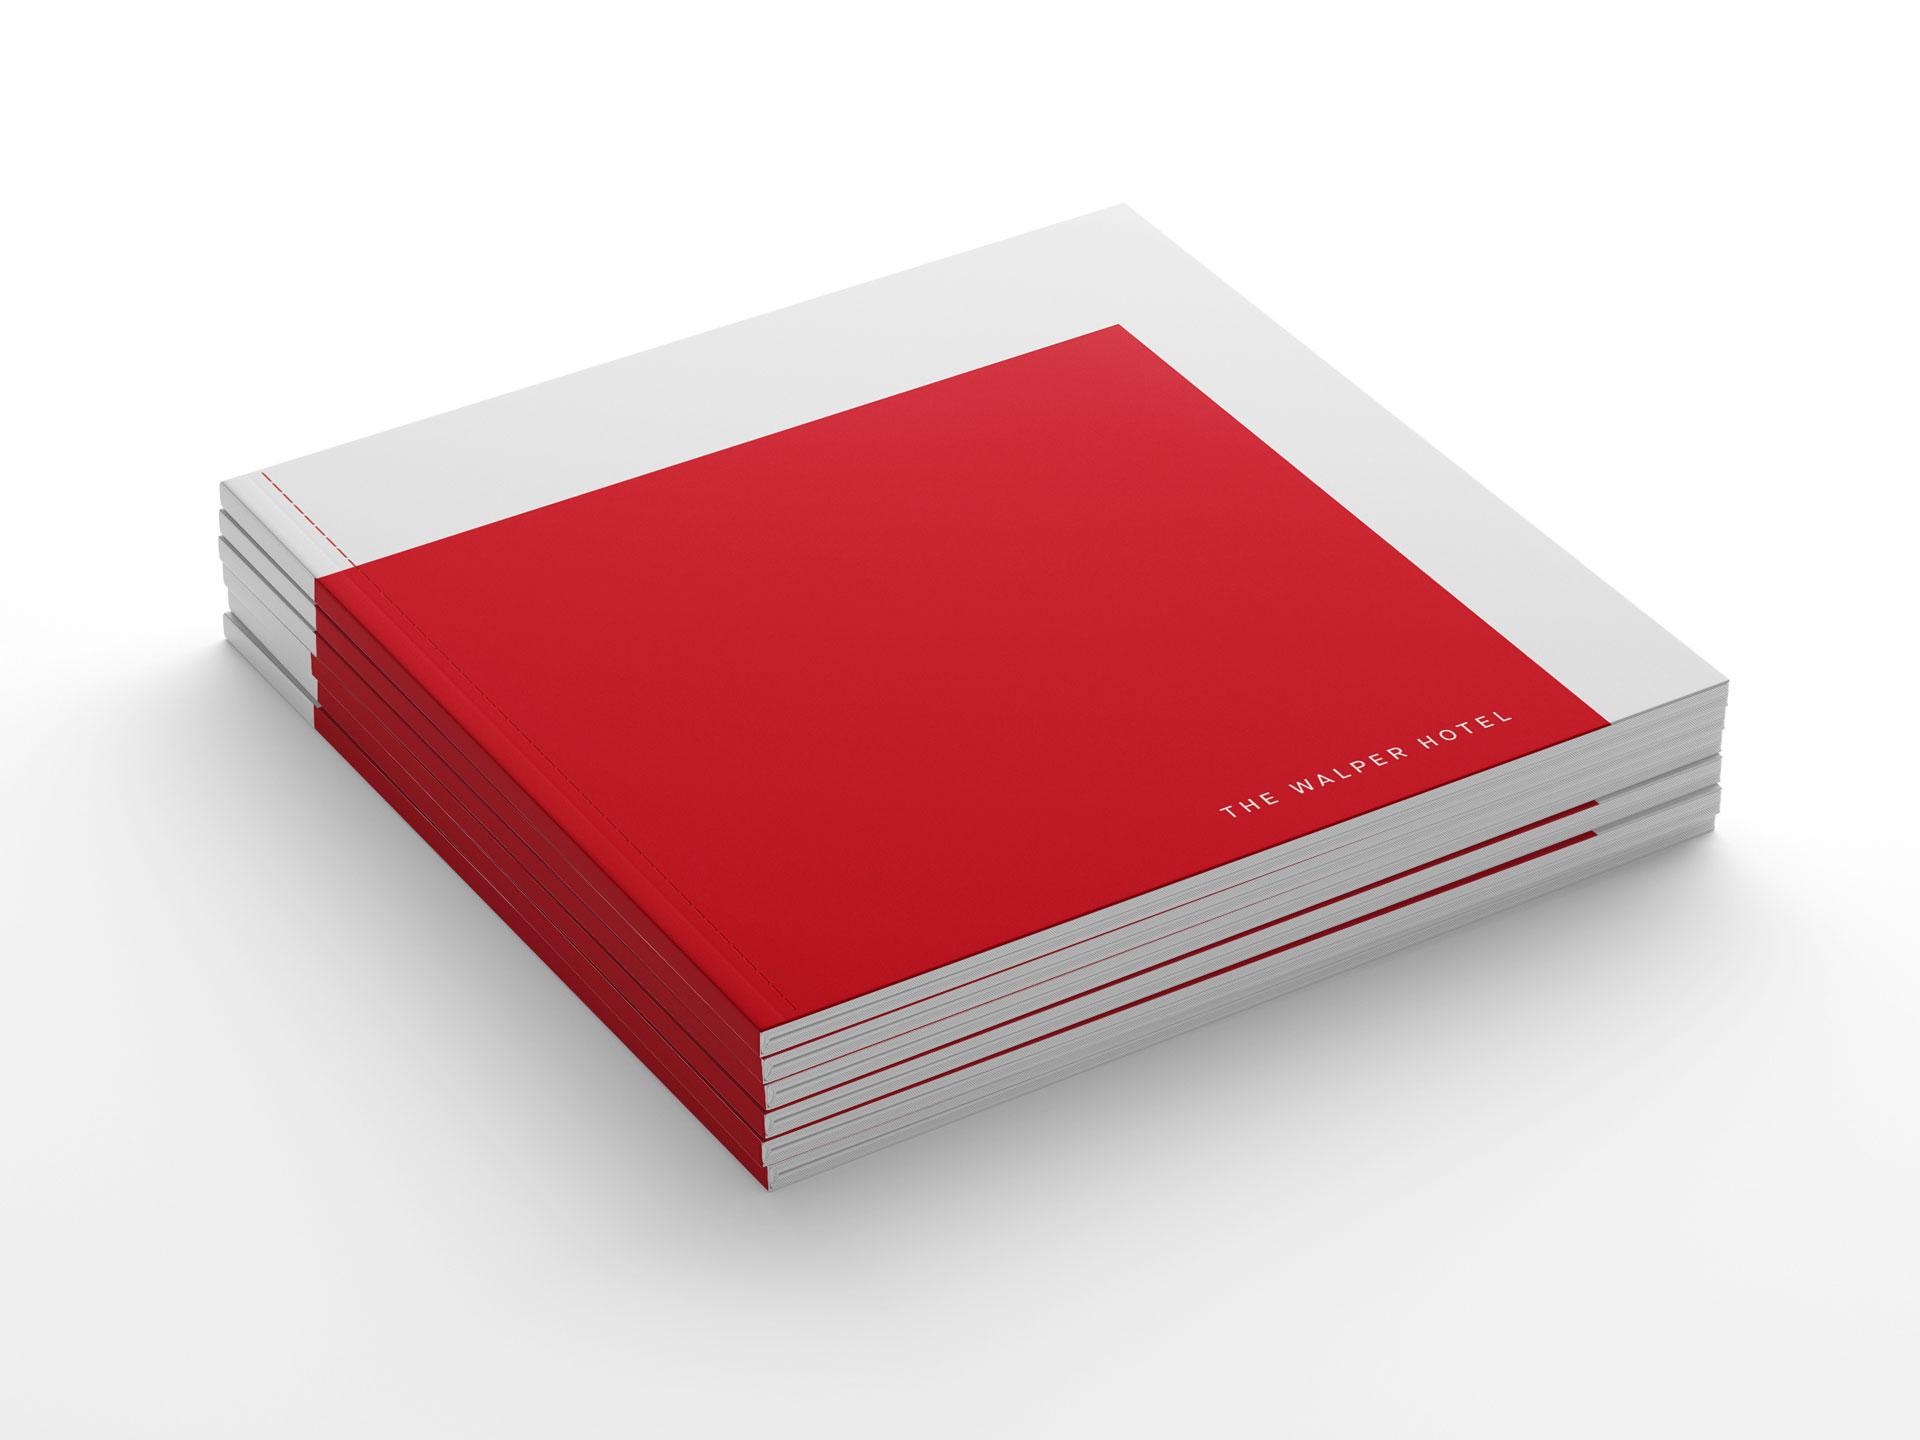 Walper Hotel boStack of Walper Hotel books with red coverok cover in red